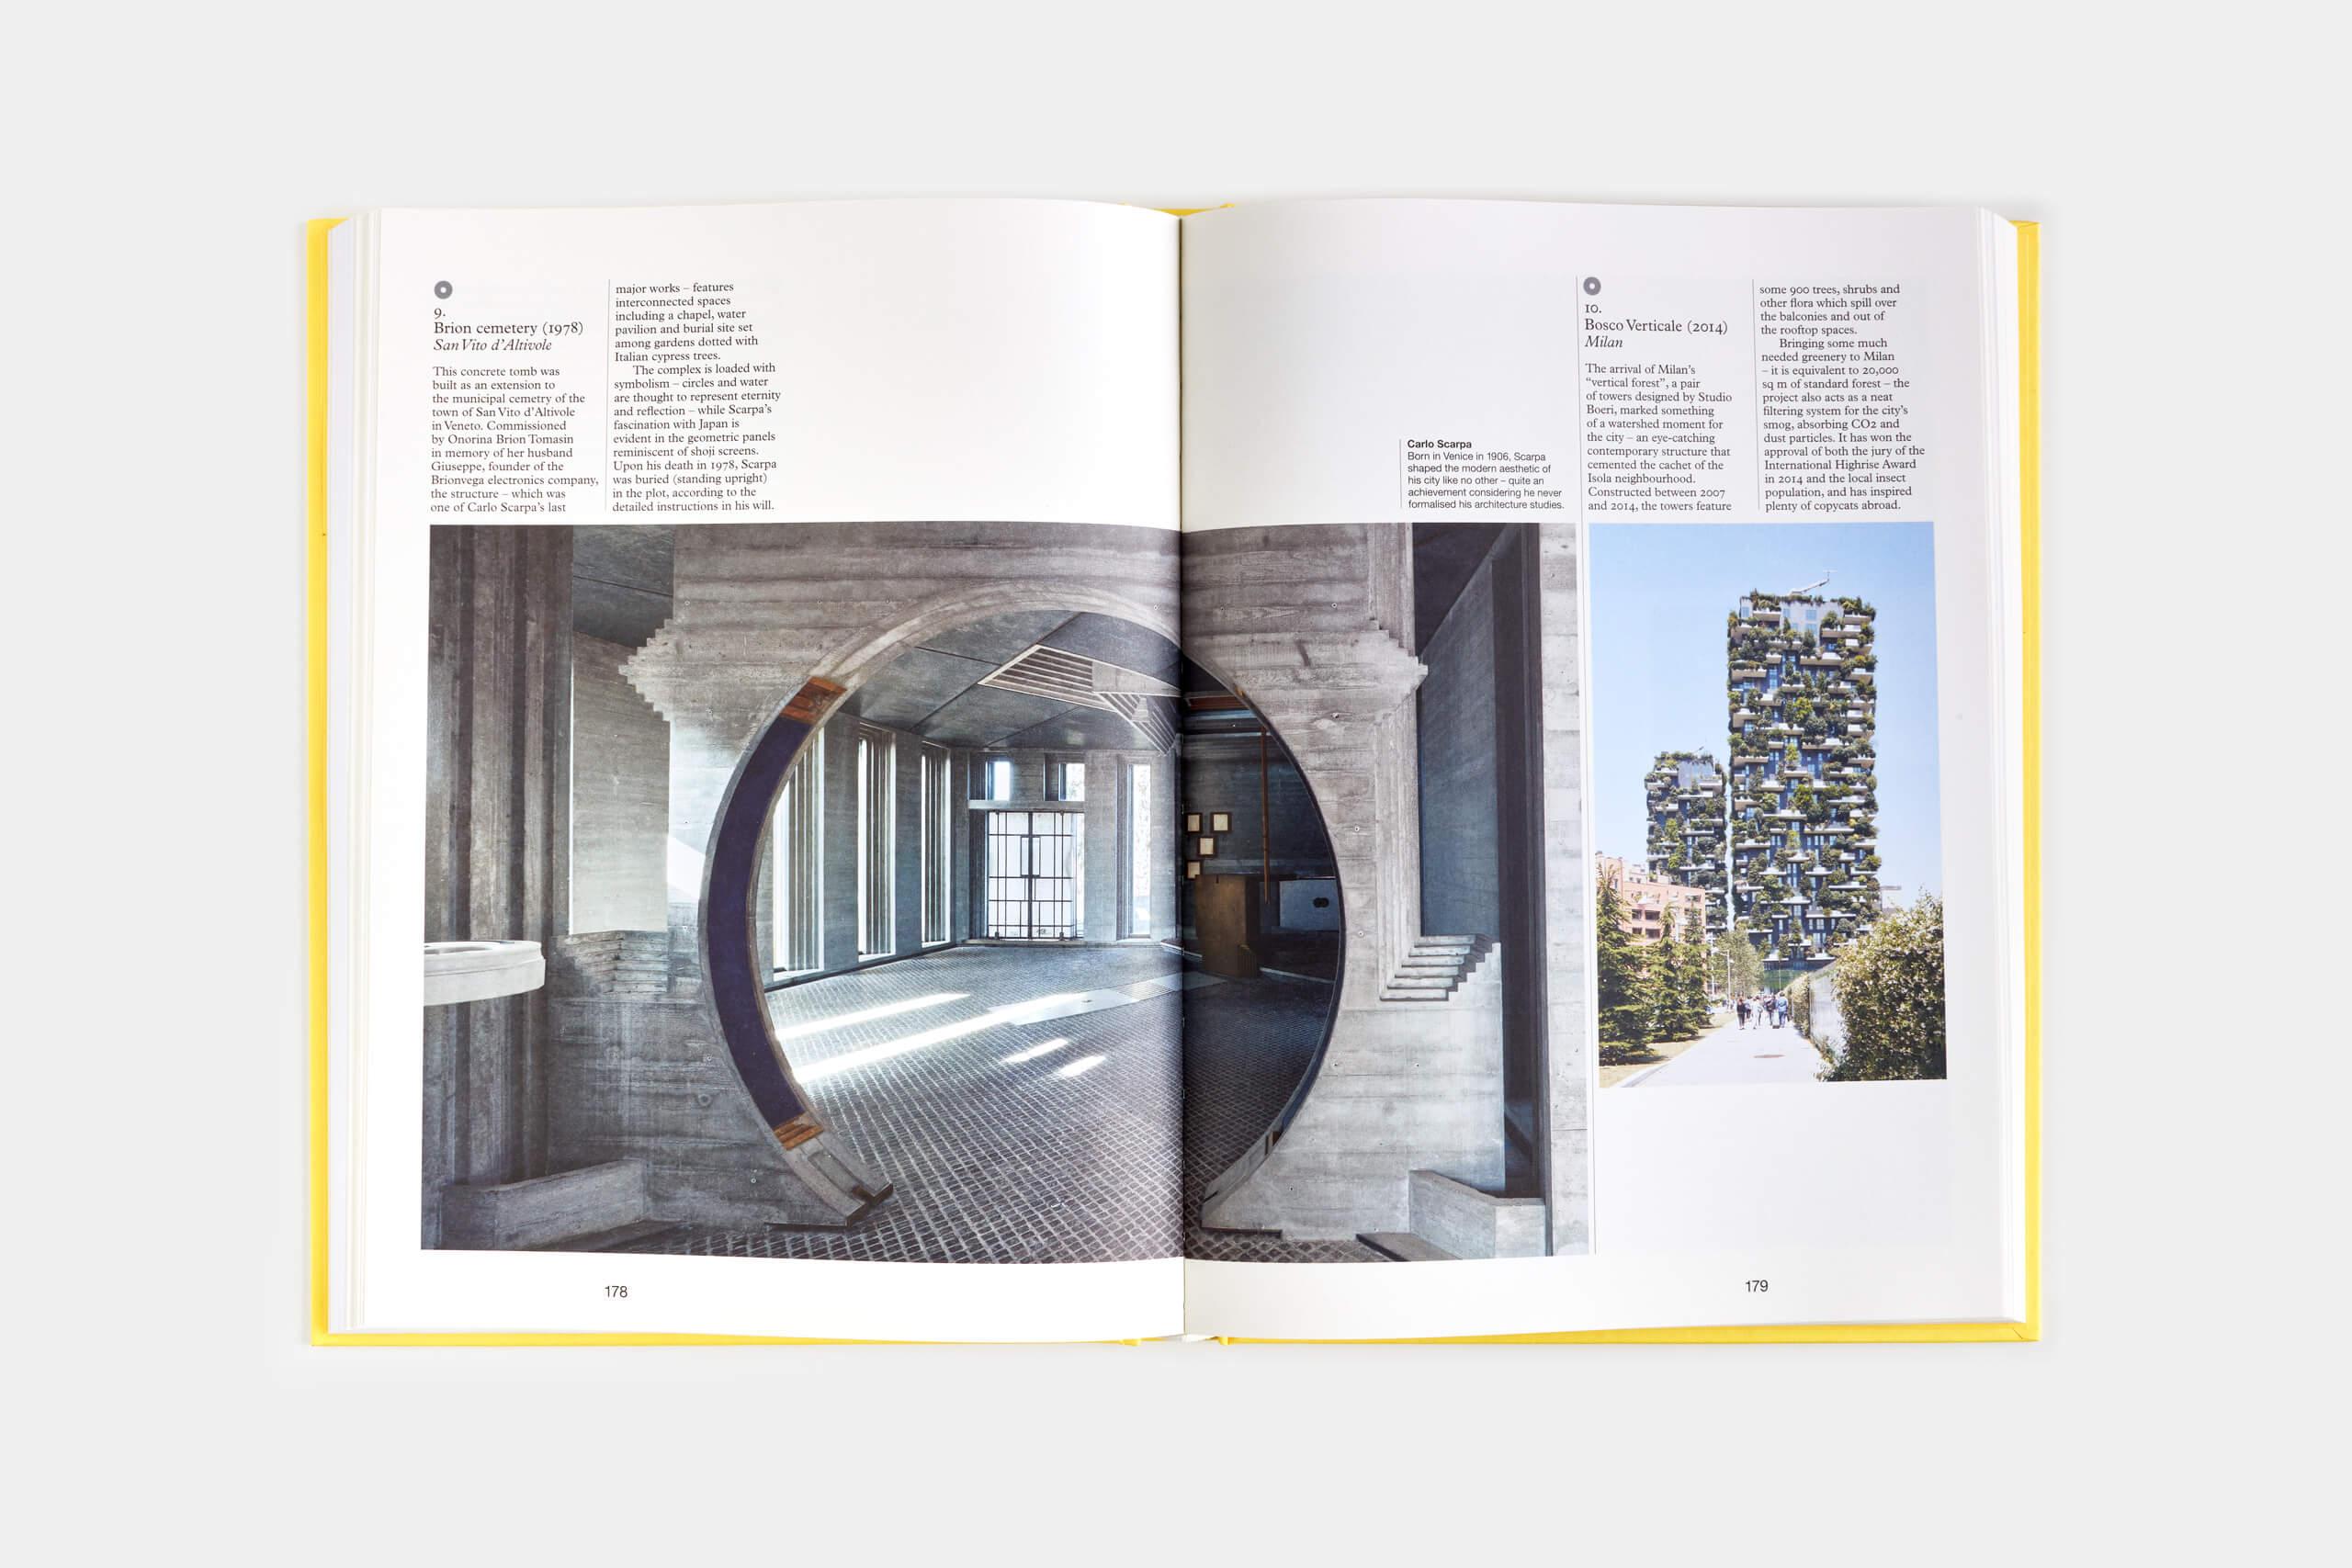 Tomba Brion – Architetto Carlo Scarpa – The Monocle Book of Italy